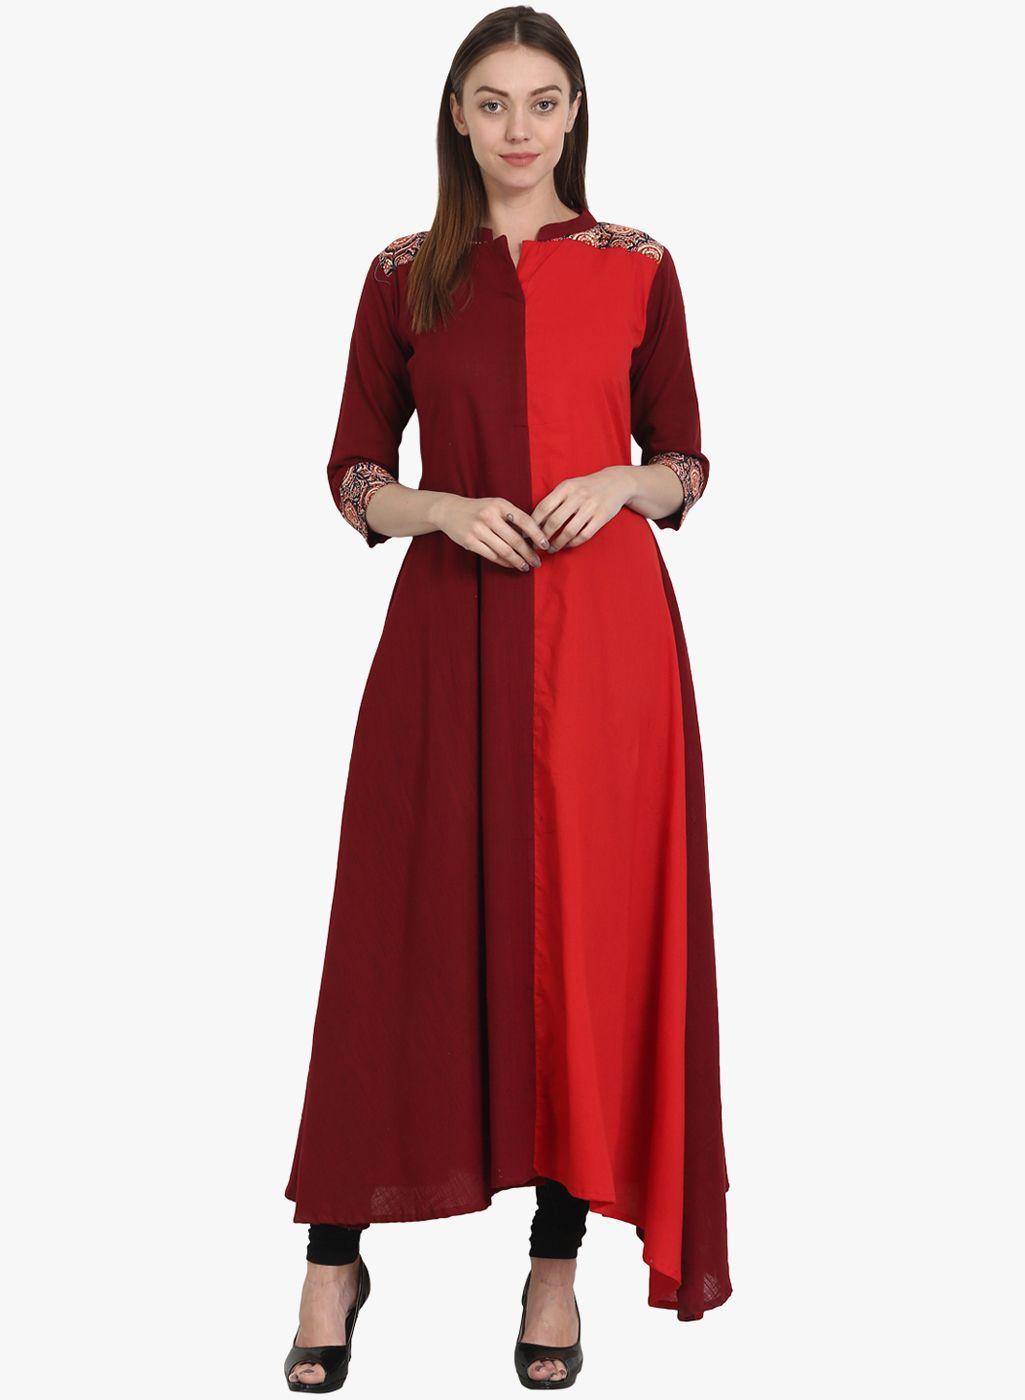 a504ceba2 Nayo Red Color Block Kurti  Cotton  Red  Kurta  Kurtis  Casual  Solid   ColourBlock  Dailywear  Mandarin